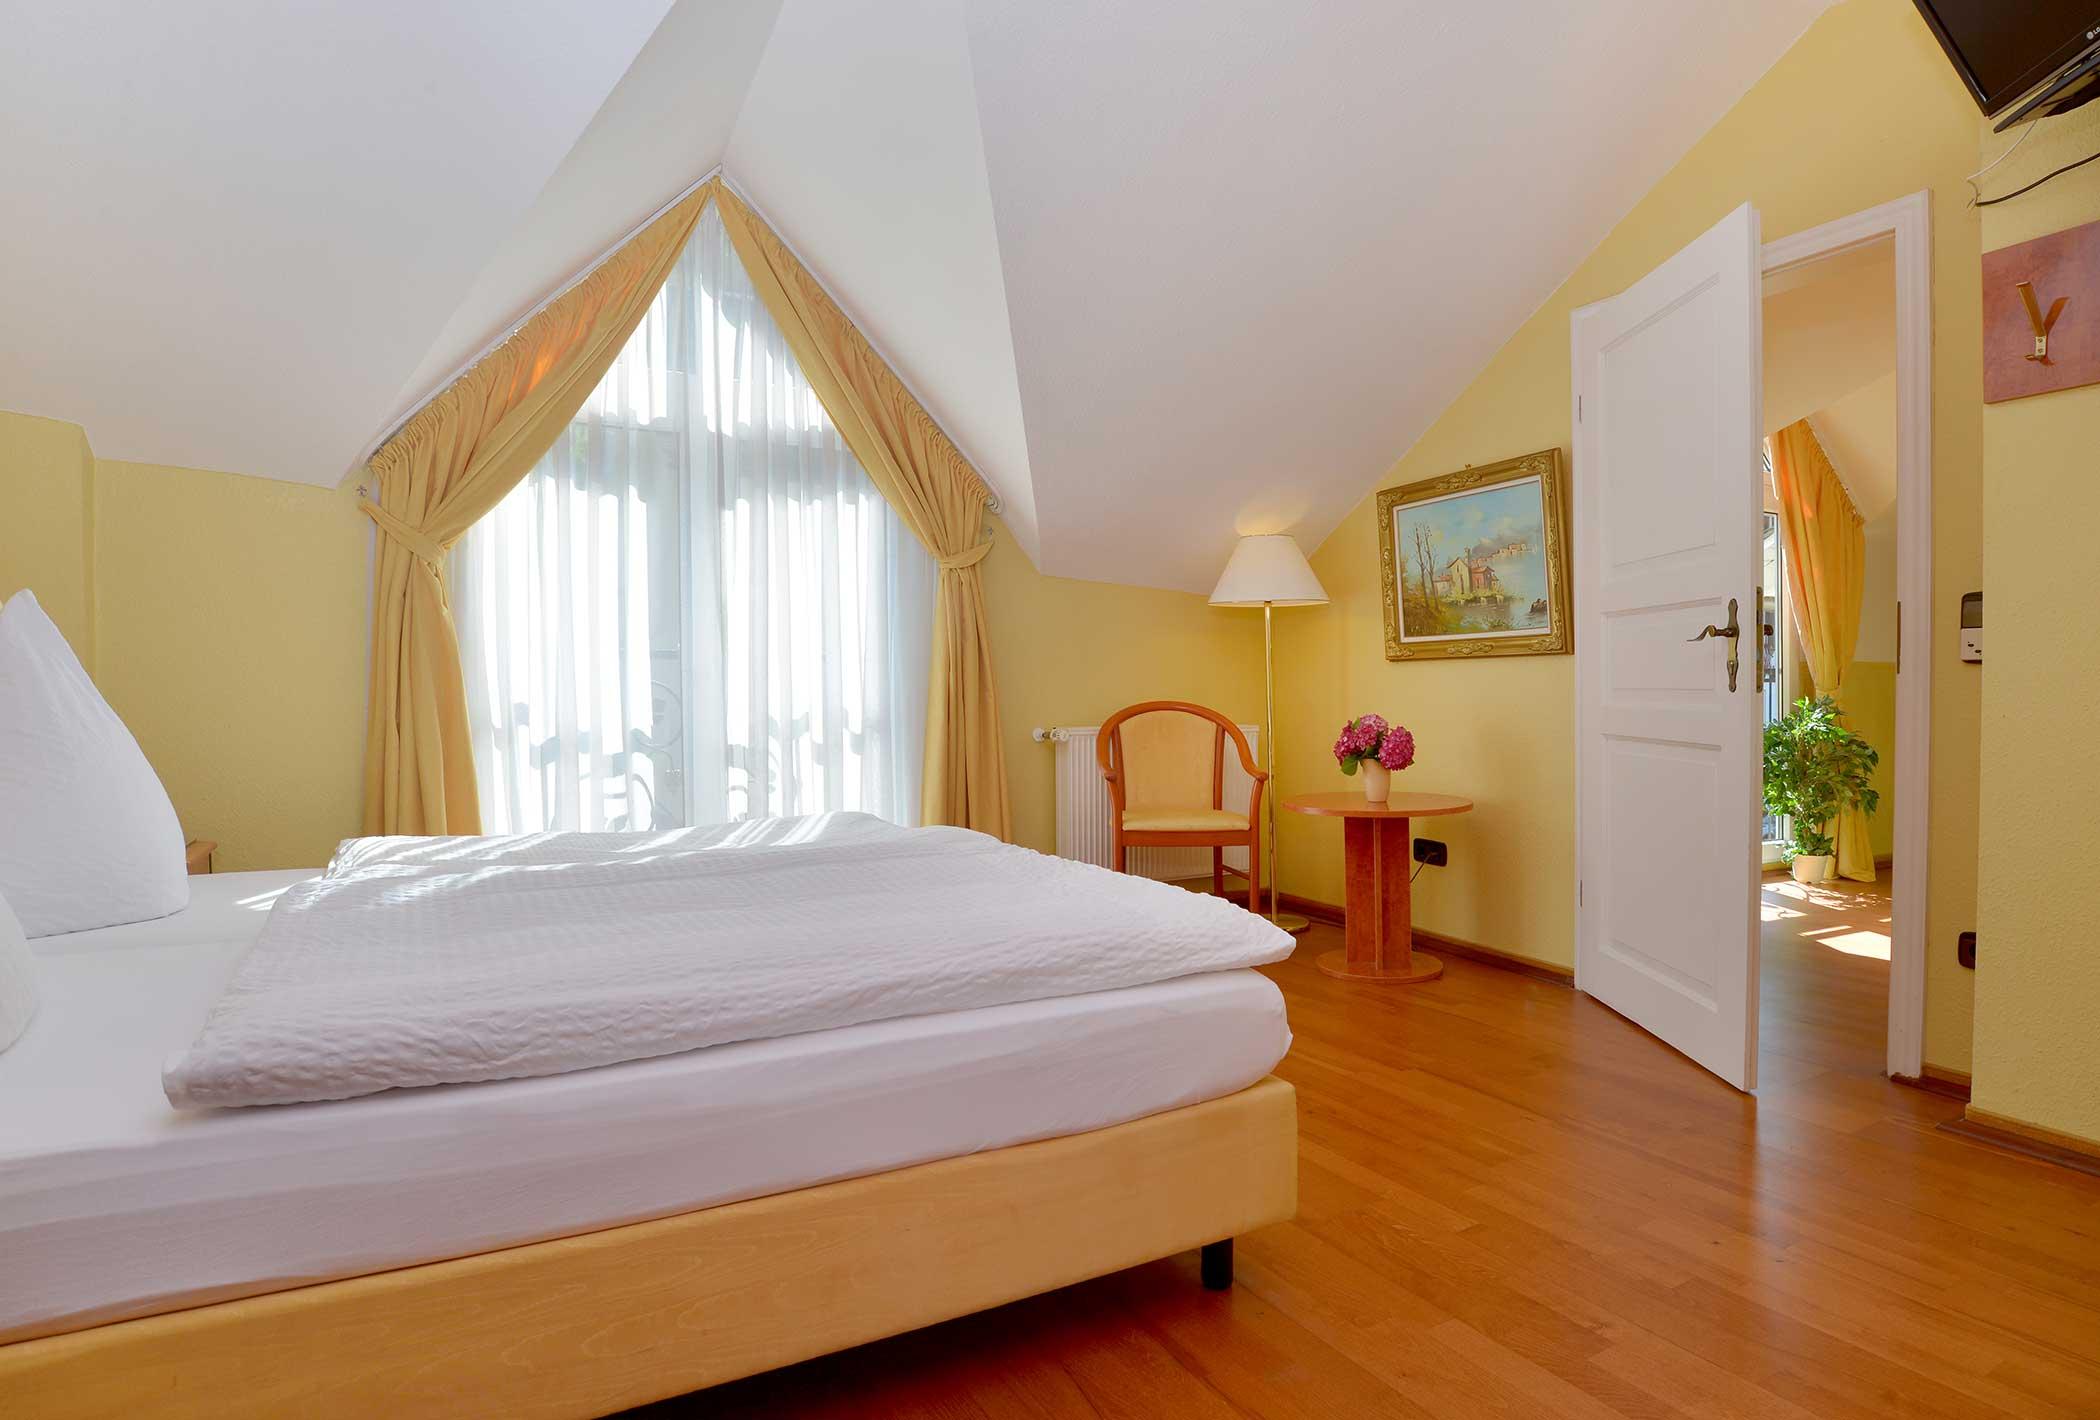 Double room Comfort Hotel Zehnthof in Cochem